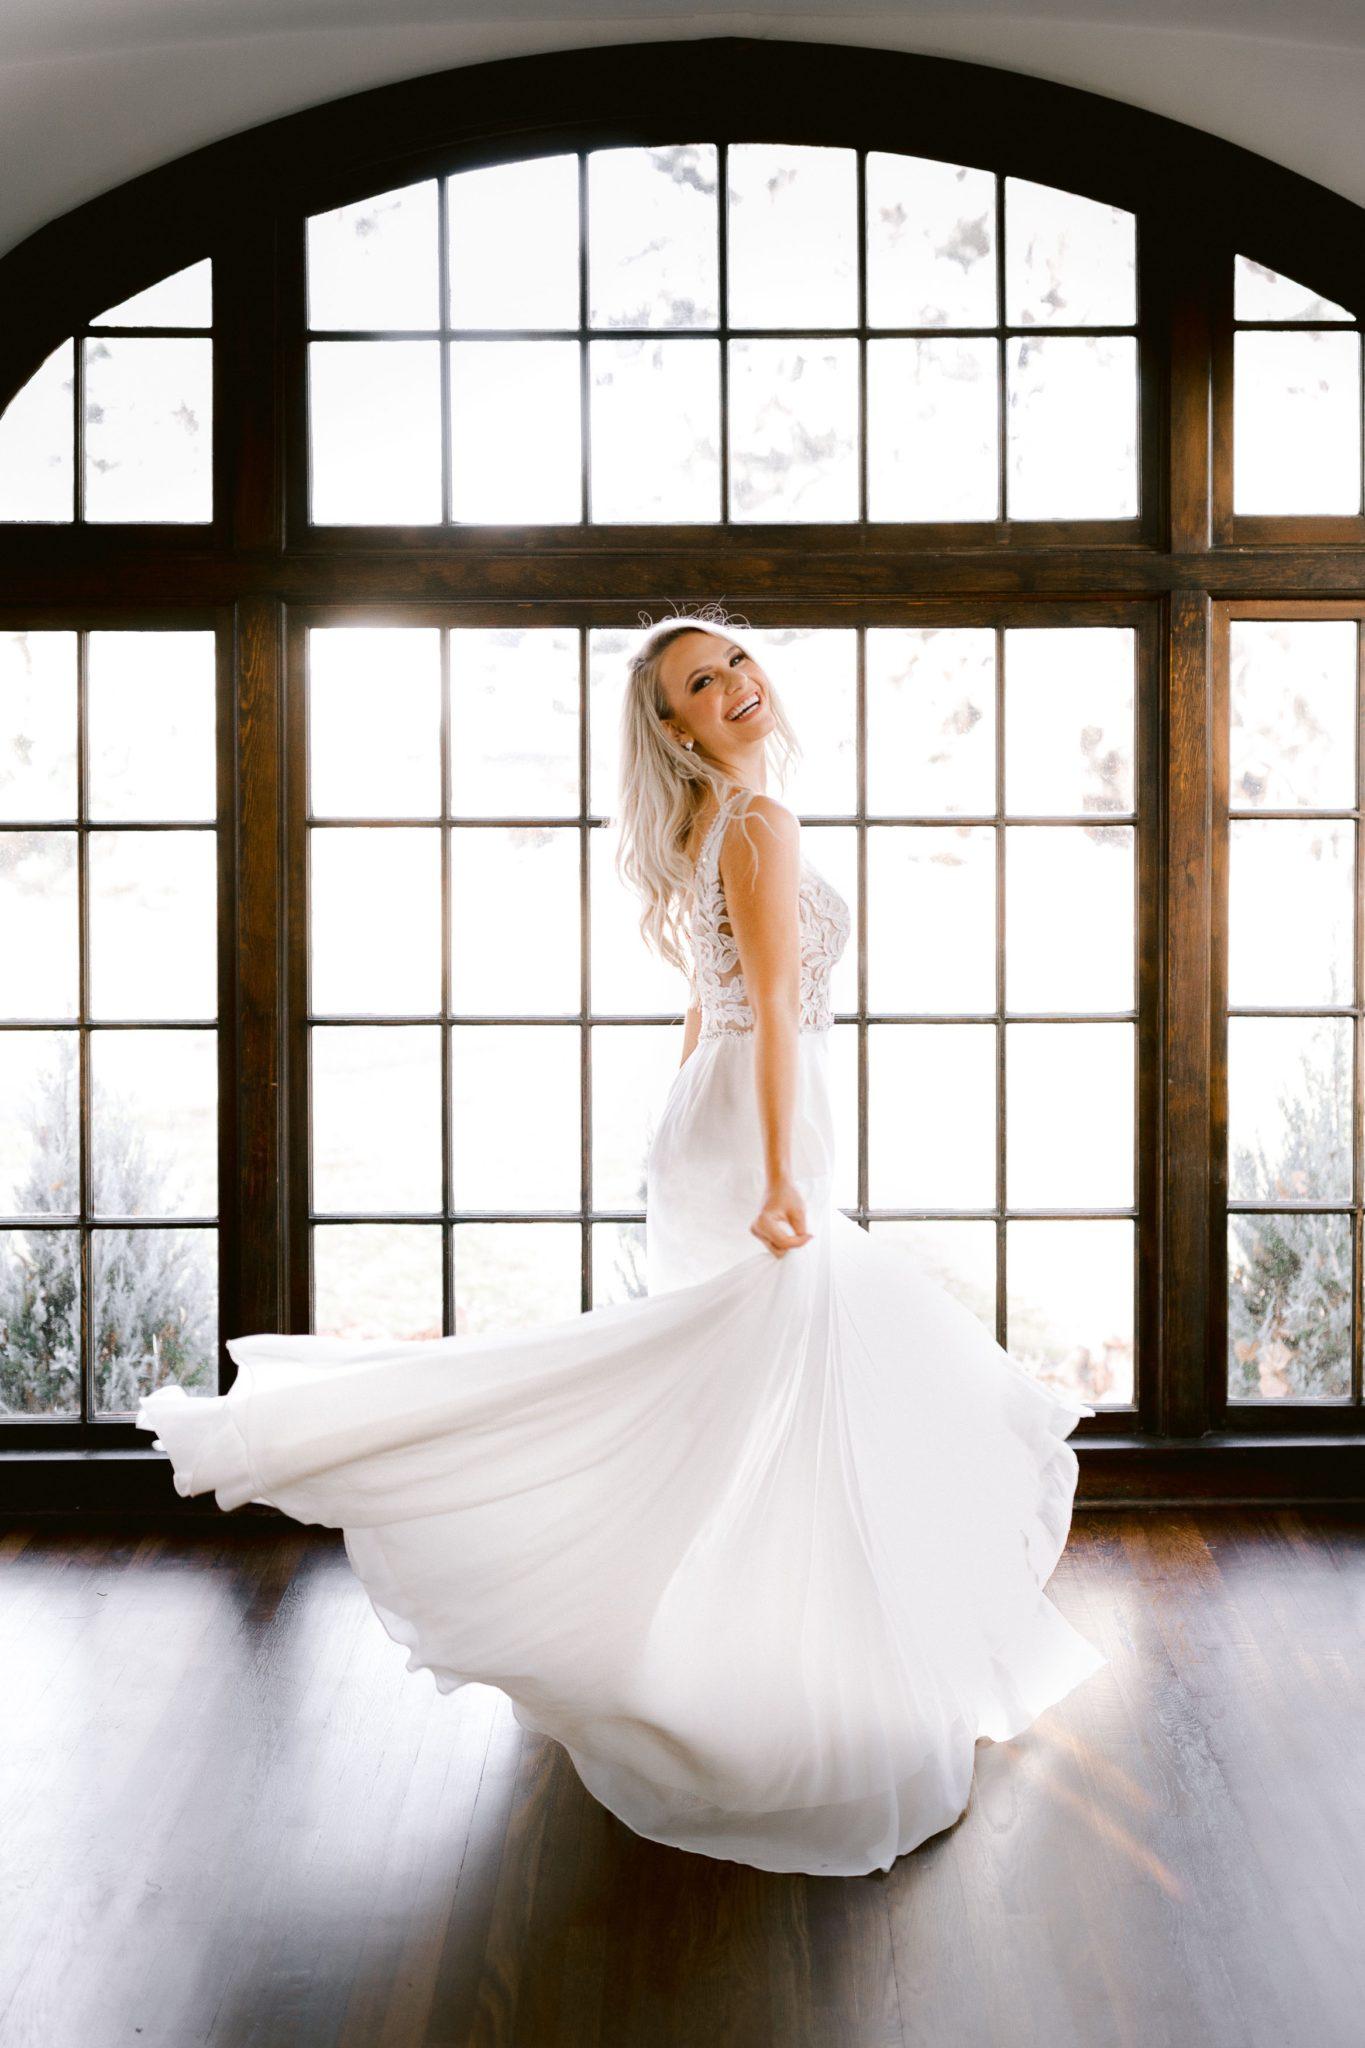 Wedding Dresses for Every Budget   David's Bridal Blog